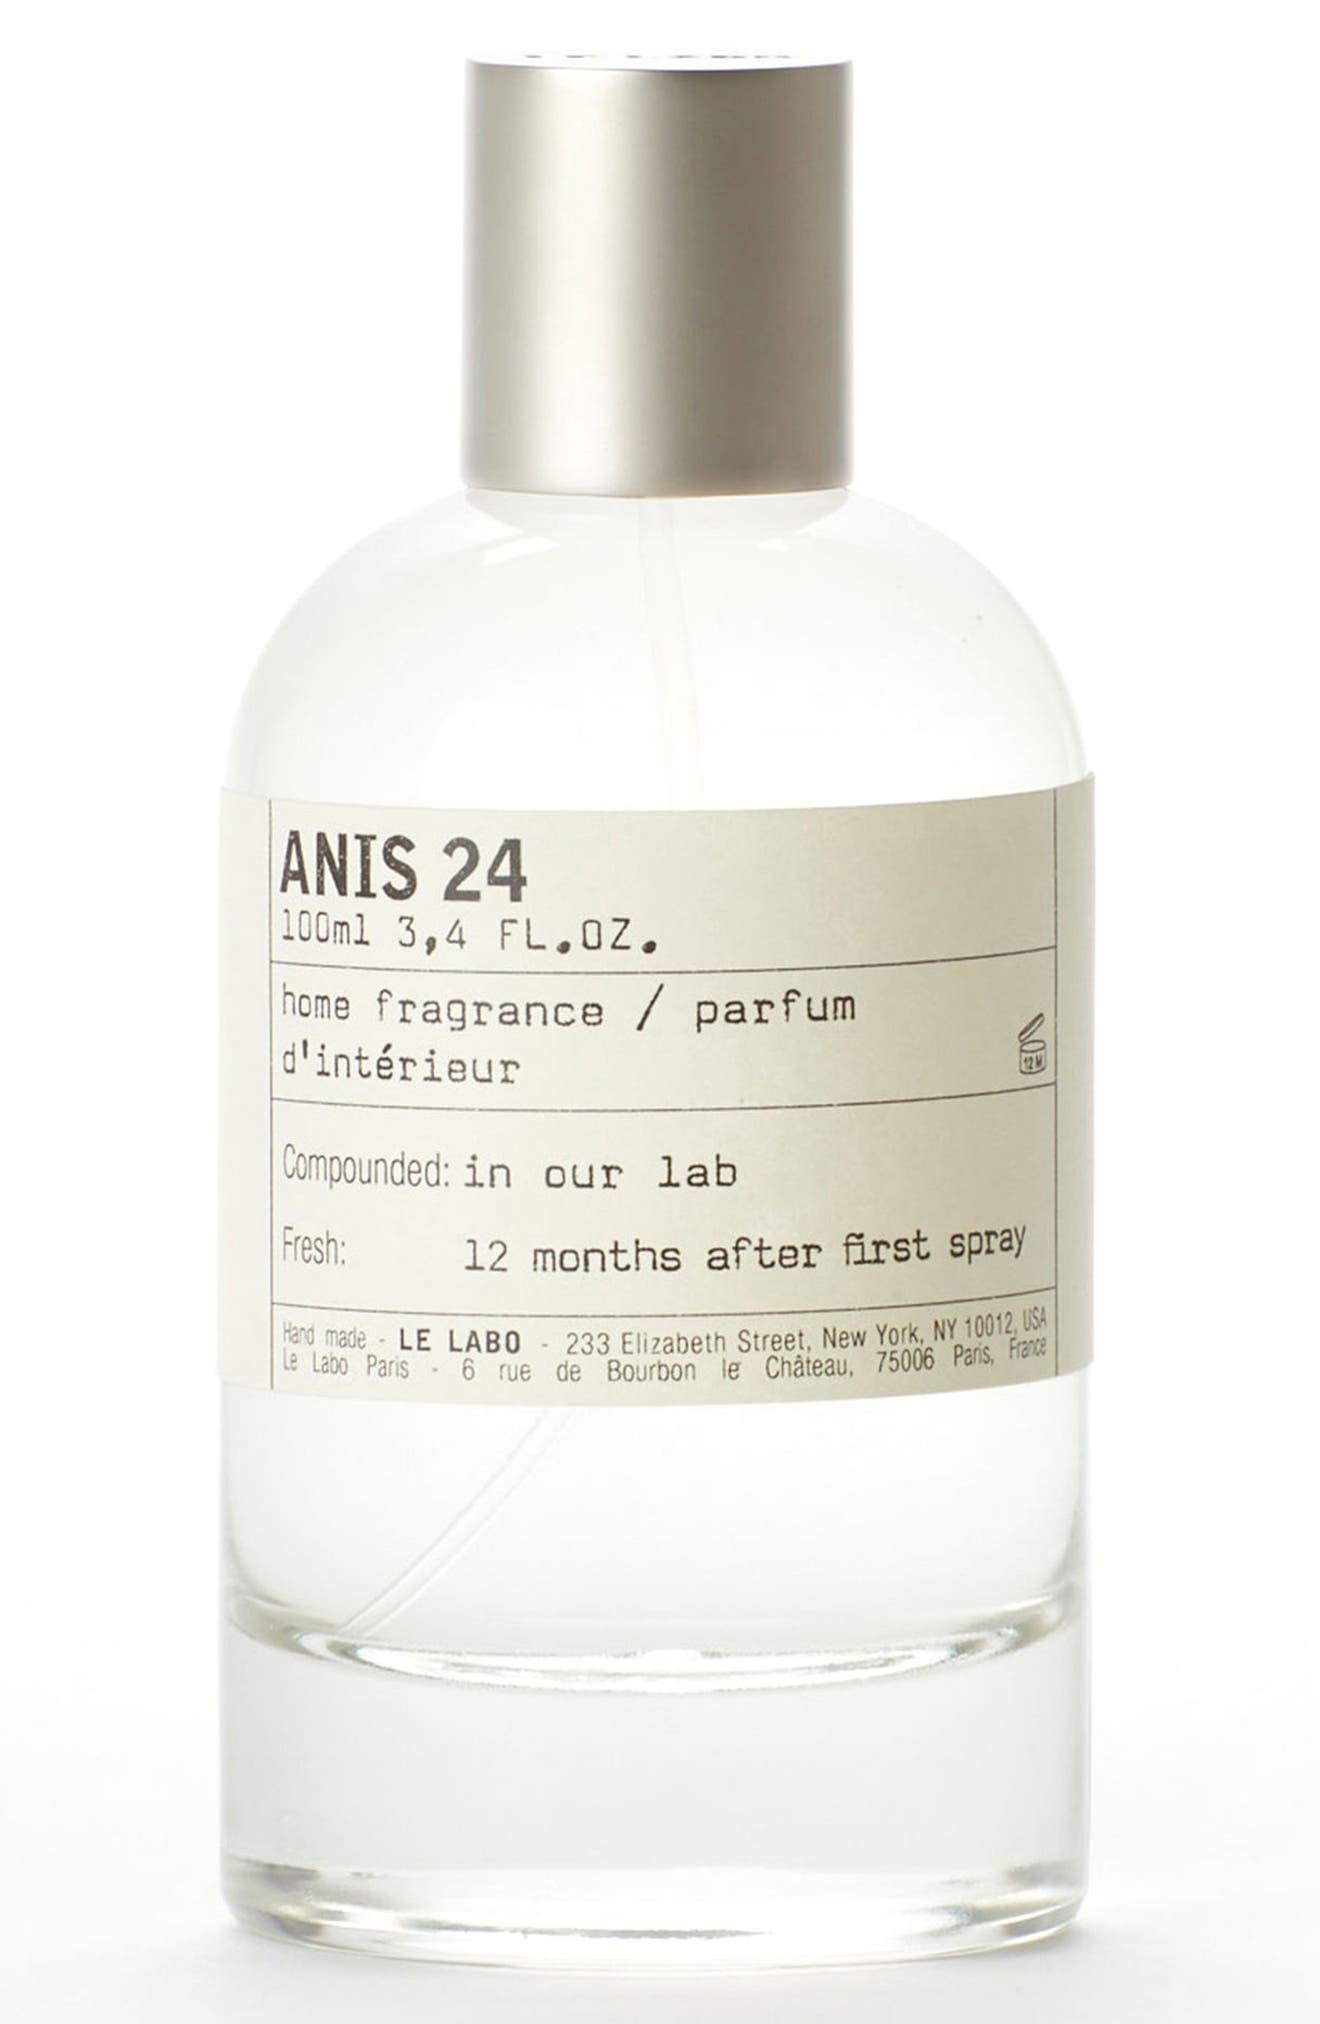 Main Image - Le Labo 'Anis 24' Home Fragrance Spray